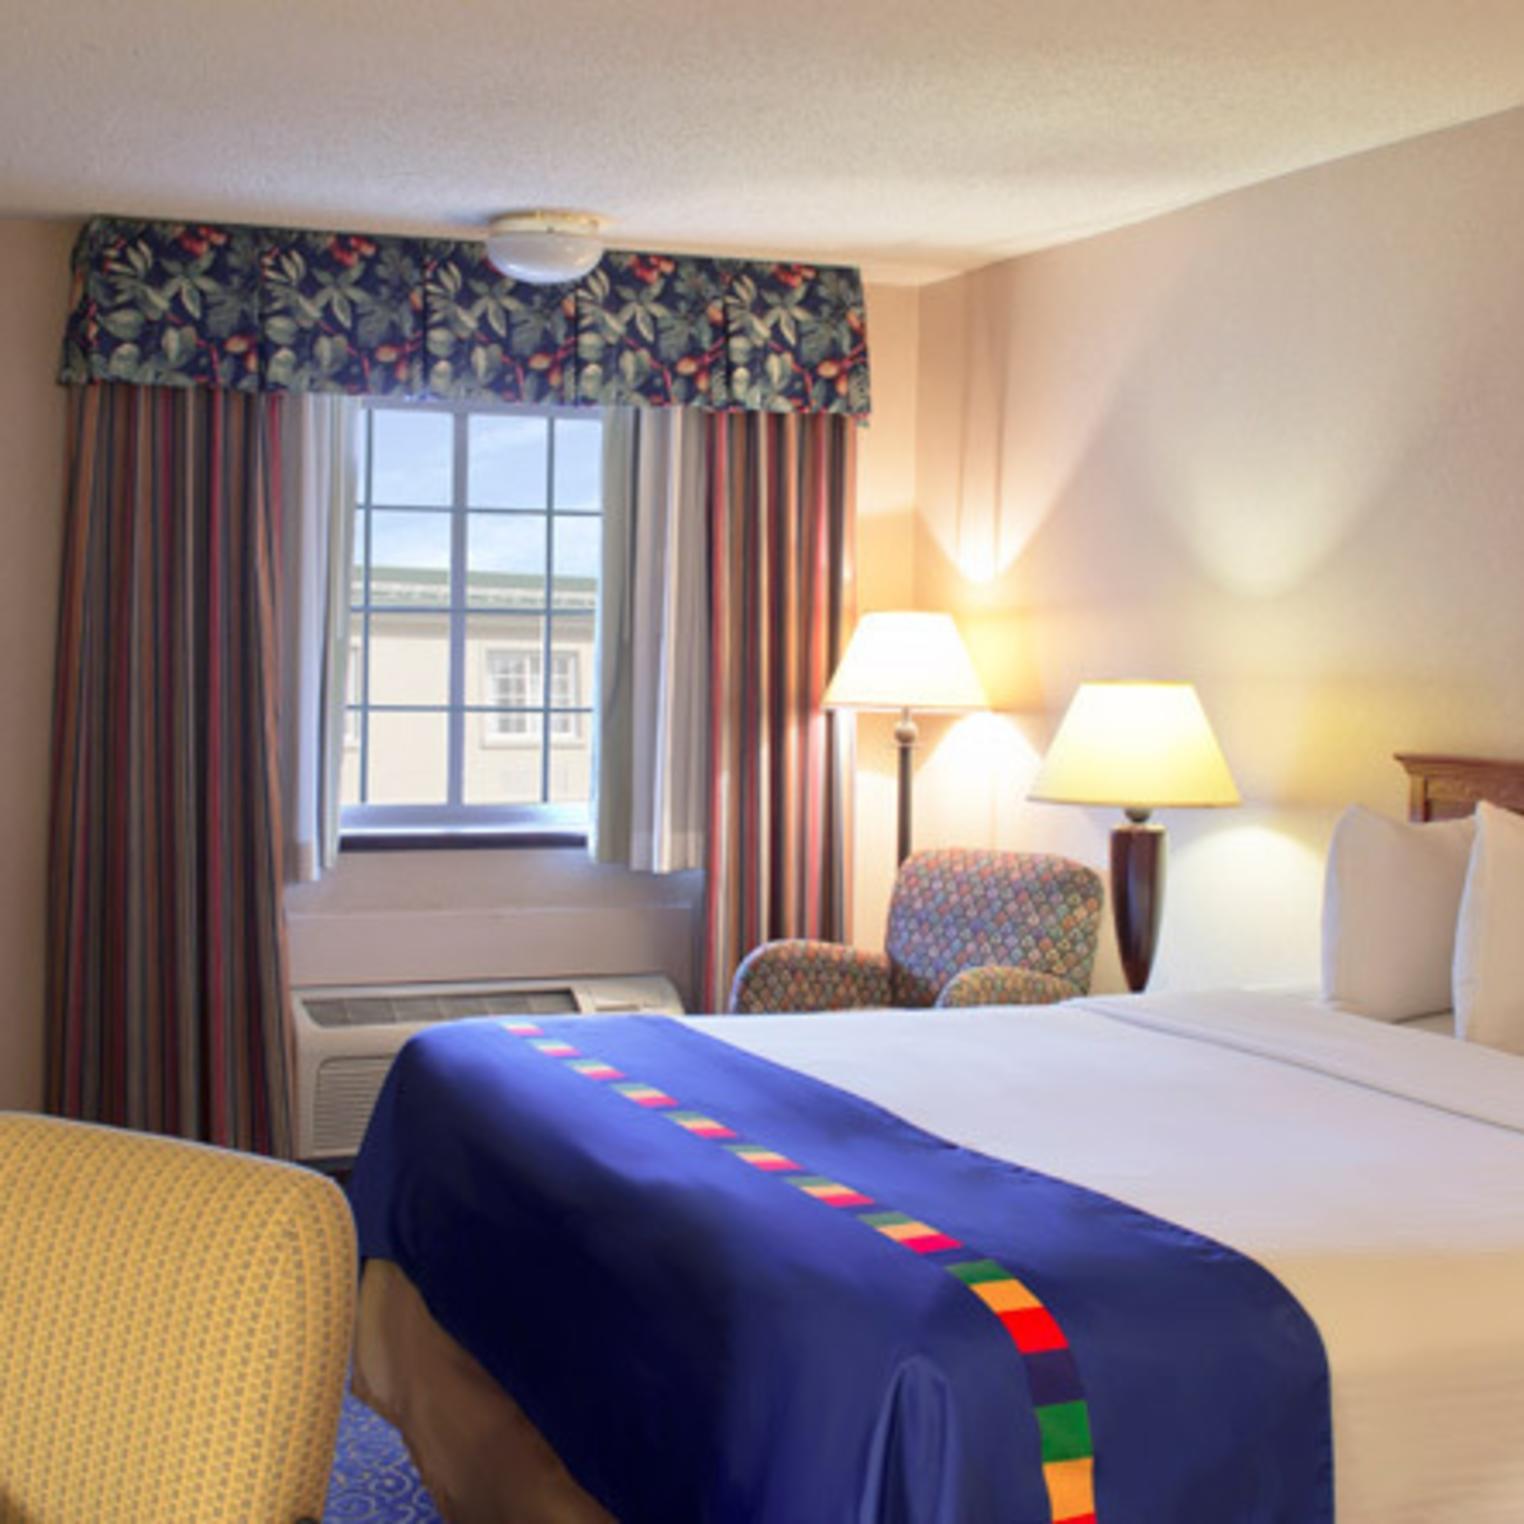 Sweet dreams from the Park Inn